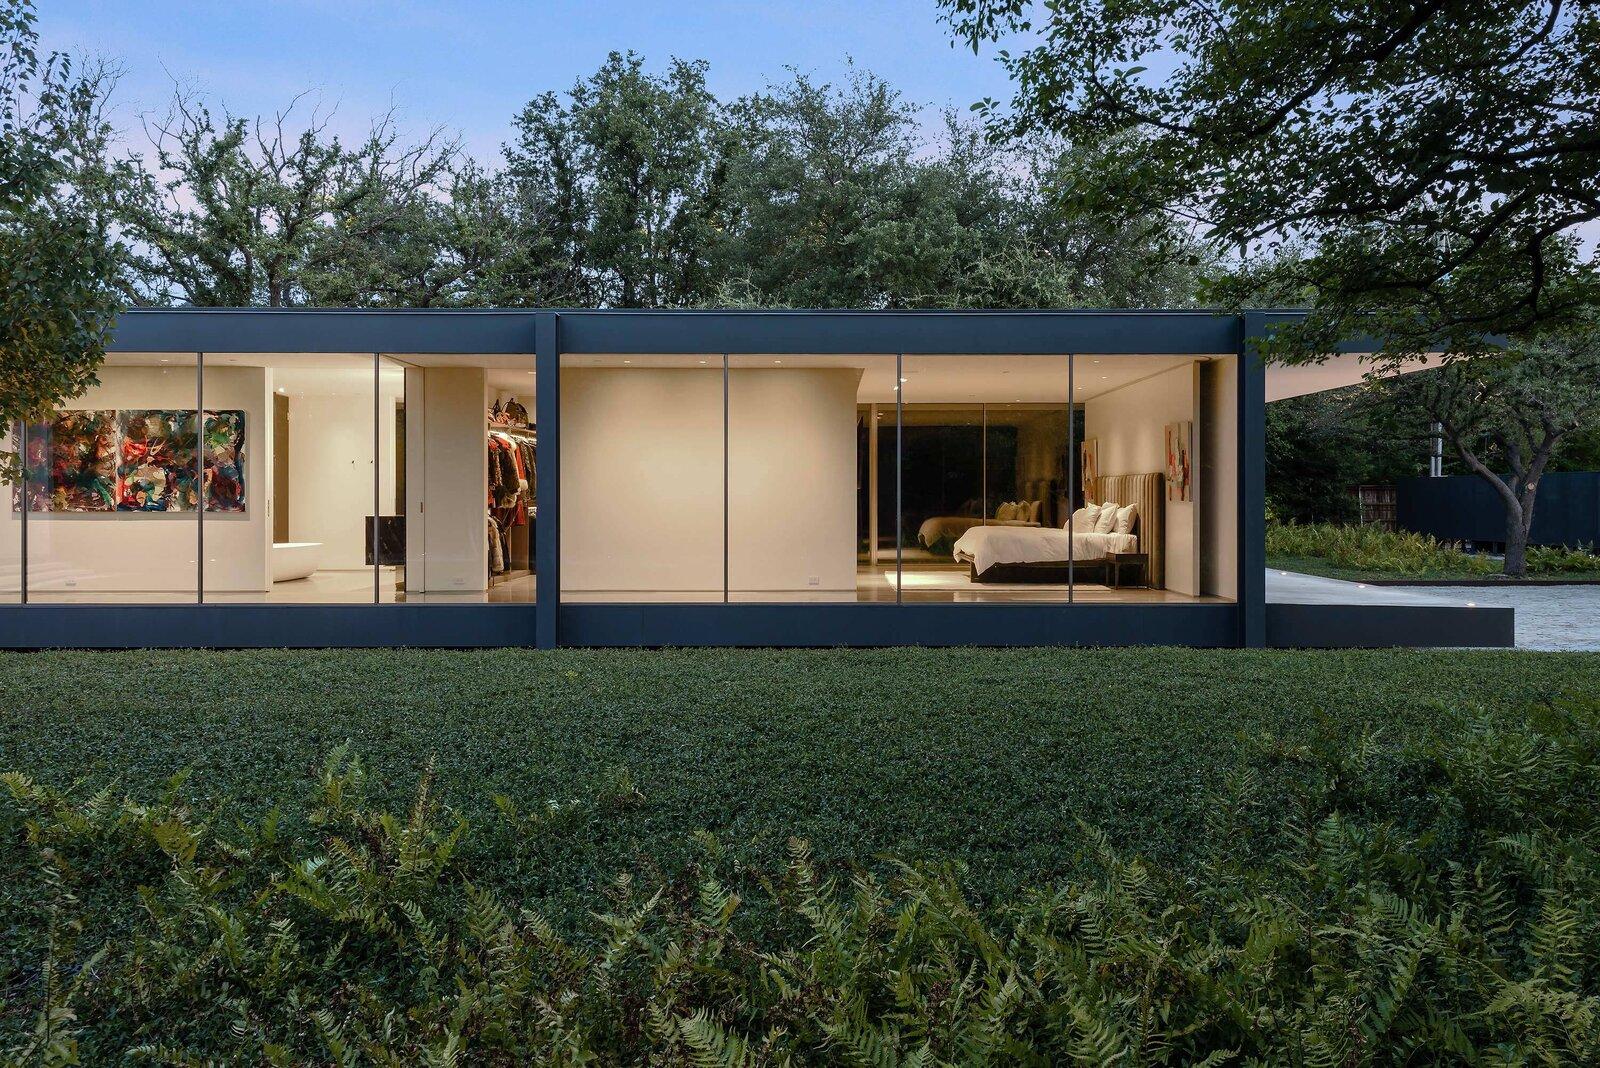 Photo 2 of 10 in A Farnsworth-Inspired Contemporary Home in Dallas Asks $7.9M